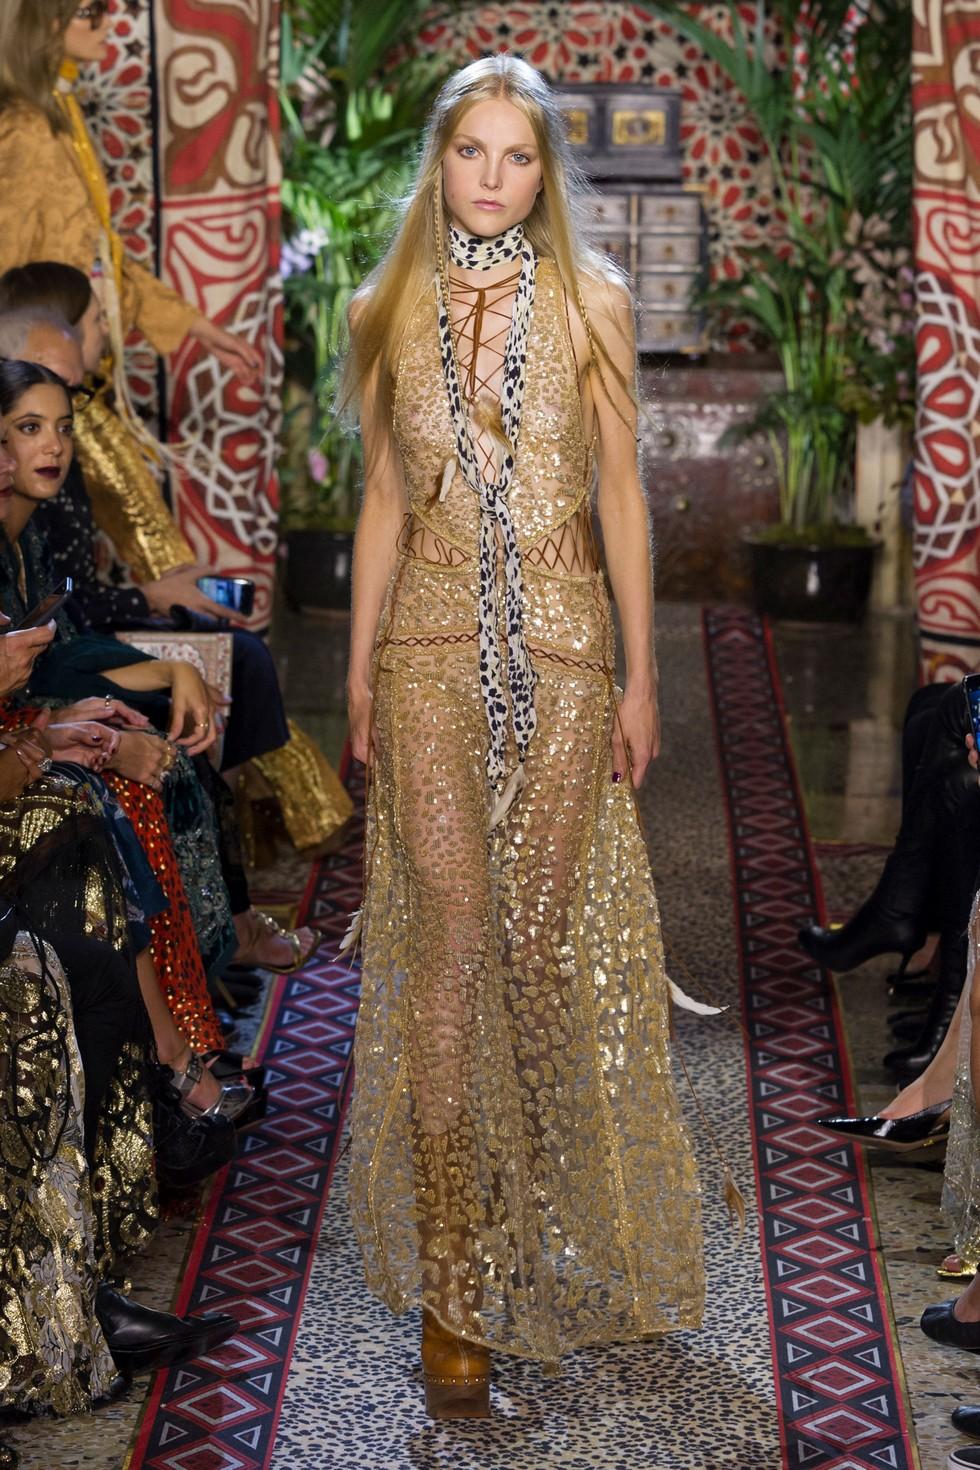 Roberto Cavalli fashion dresses milan fashion spring summer 2017 Milan Fashion Spring Summer 2017 – day one best moments Roberto Cavalli 2